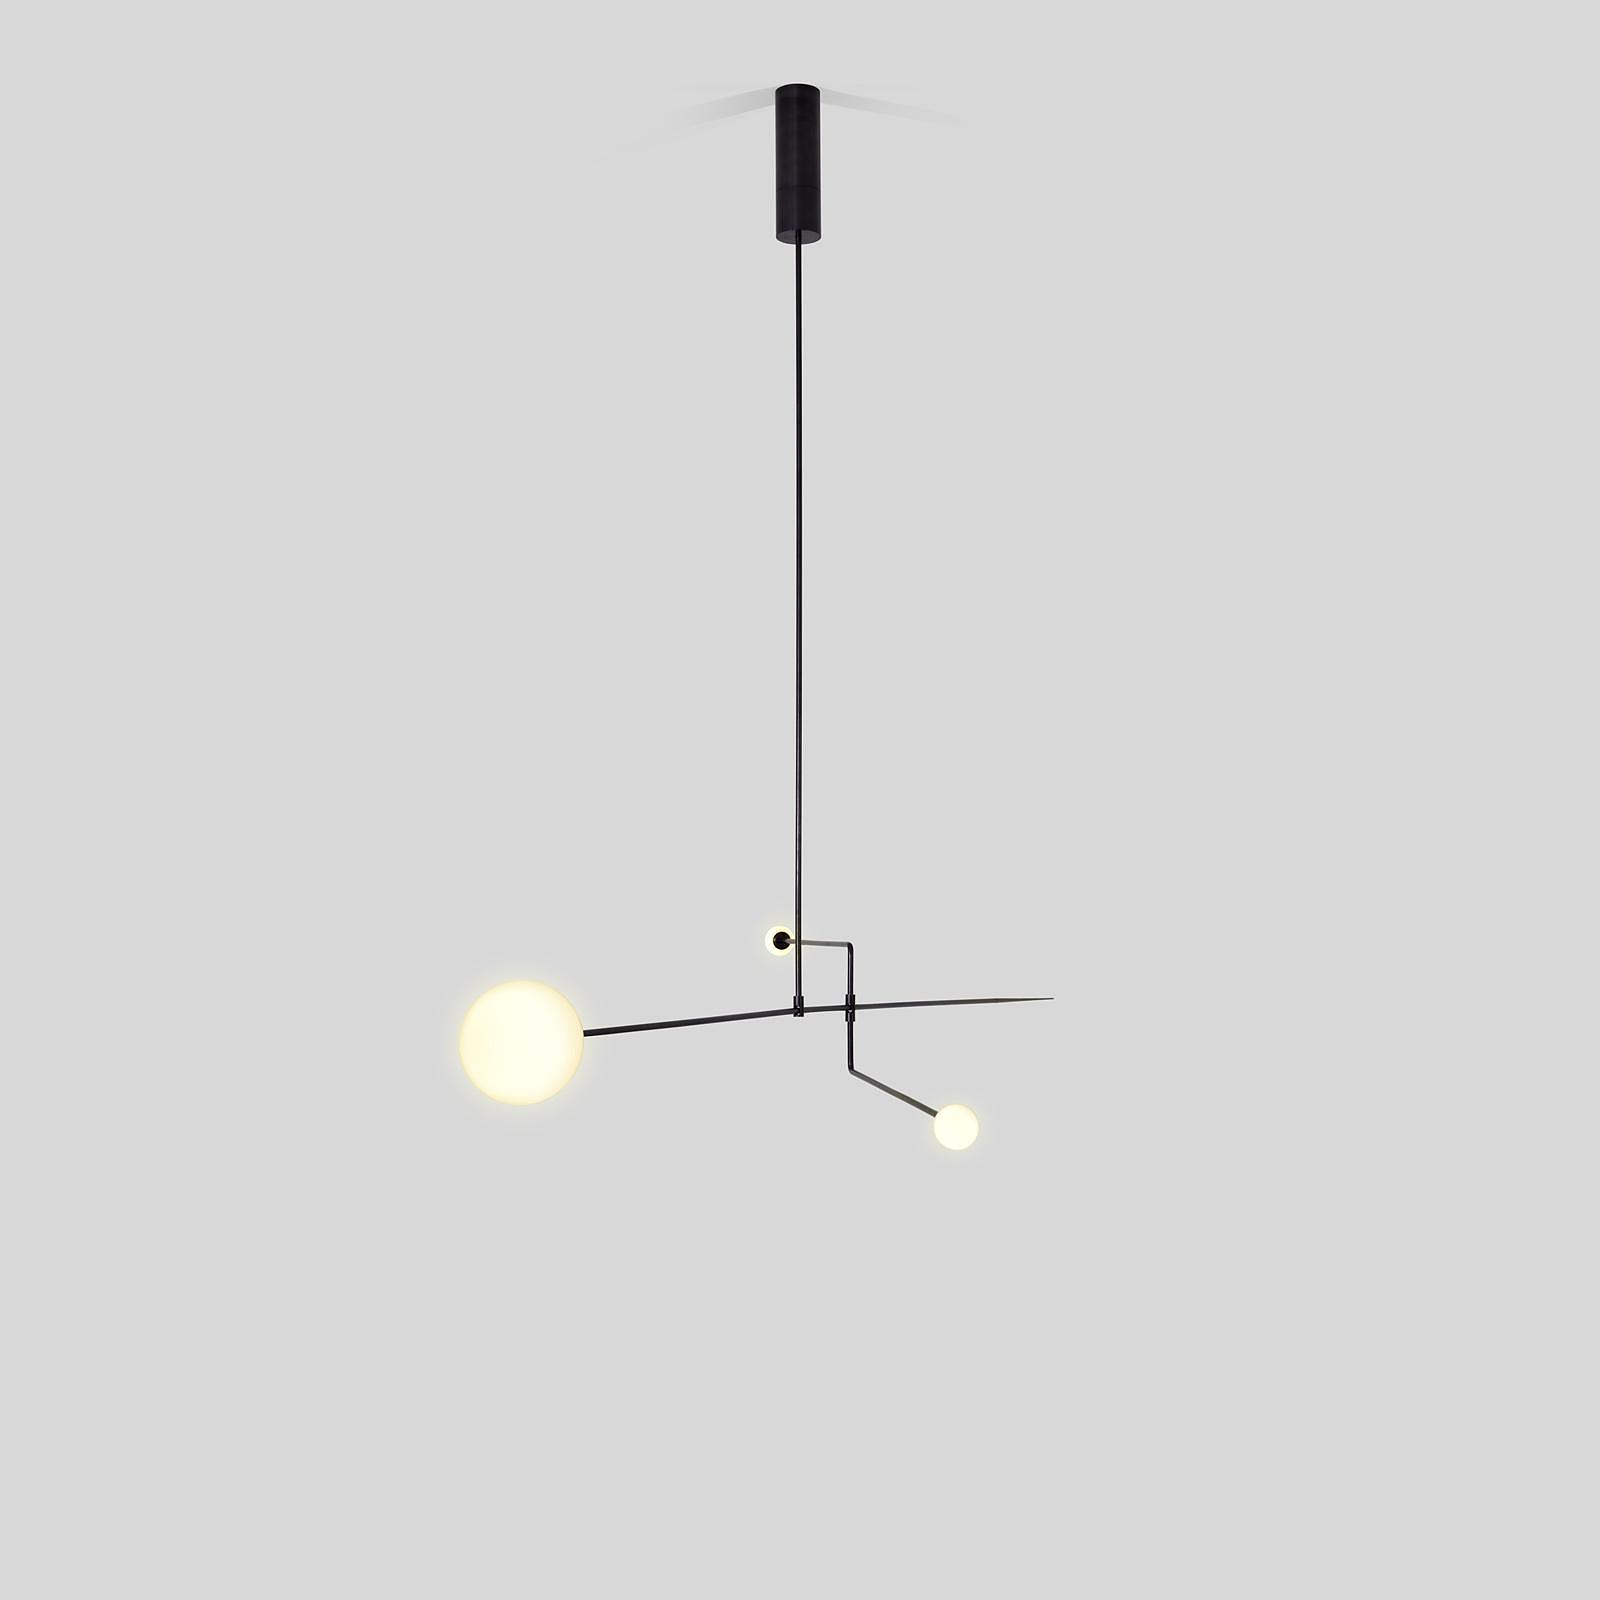 Michael Anastassiades' Mobile Chandeliers & Kinetic Lights.